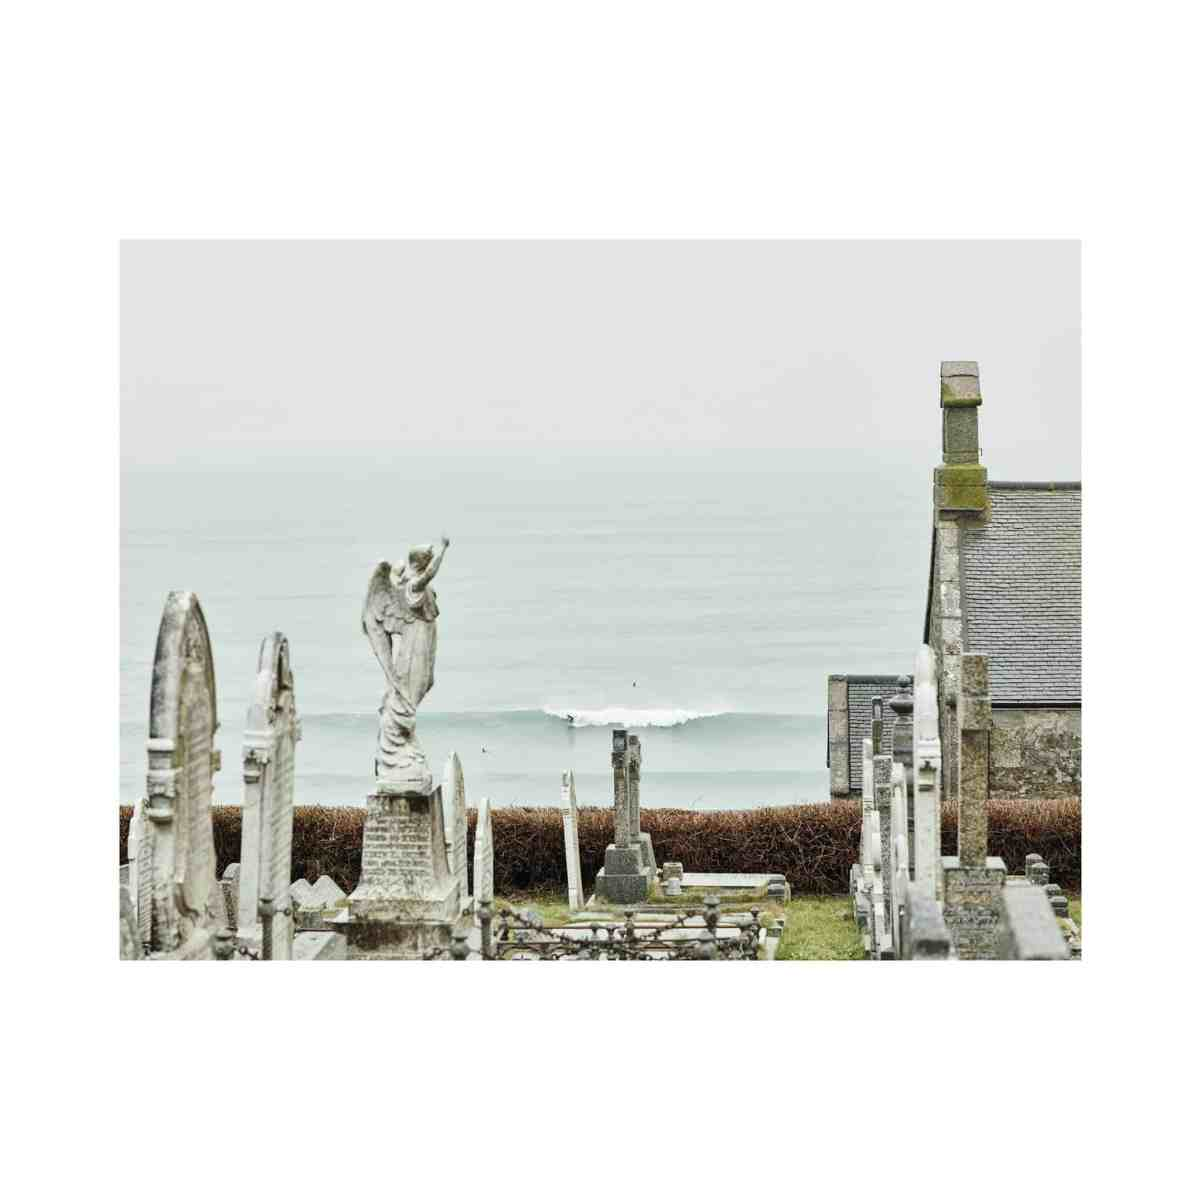 porthmoer-beach-a1-print-only-tom-shaw-another-country_bf32016f-a239-4c4a-b631-6e7459dd68db.jpg